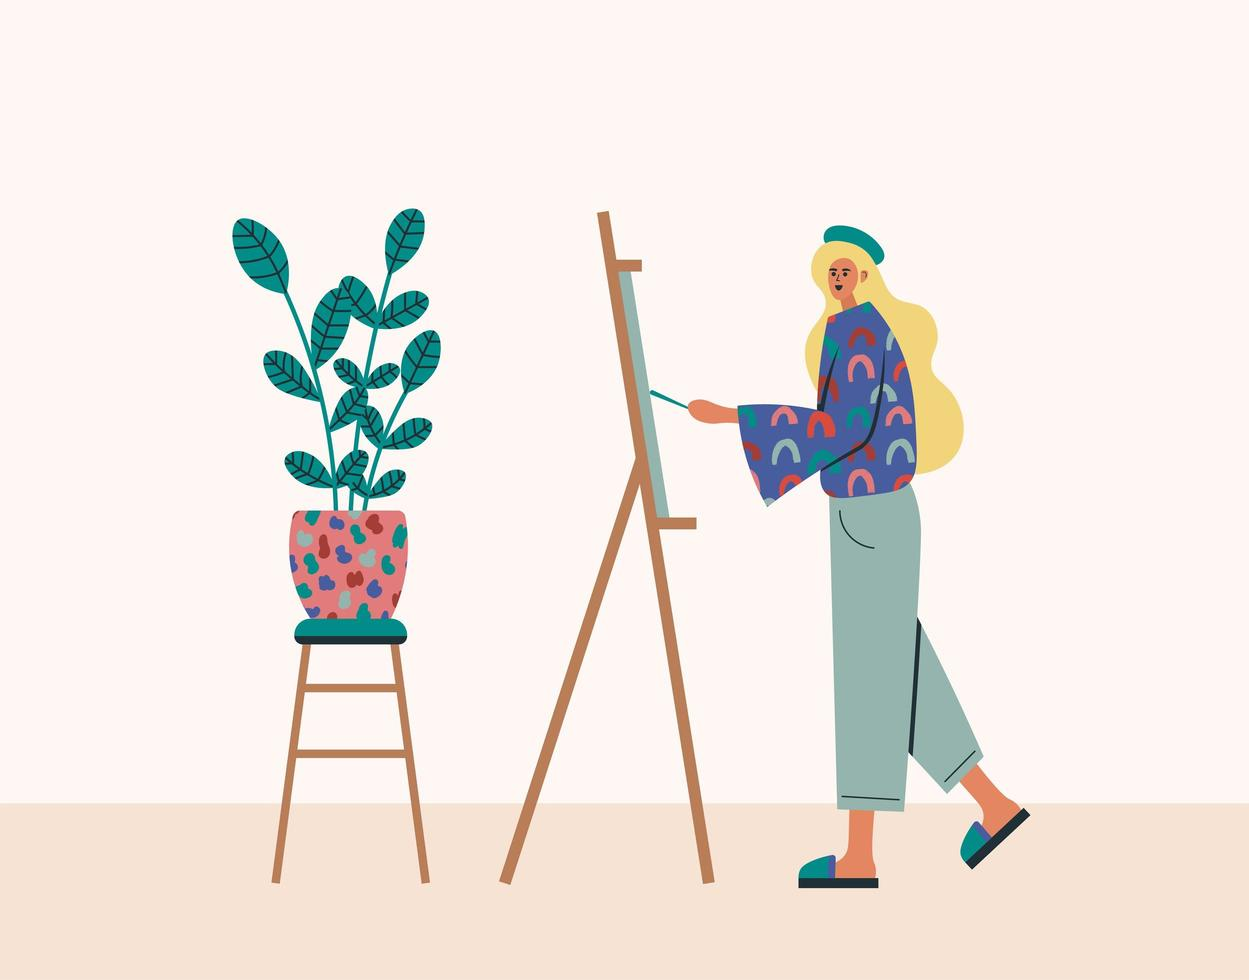 mujer joven pintando en caballete en casa vector